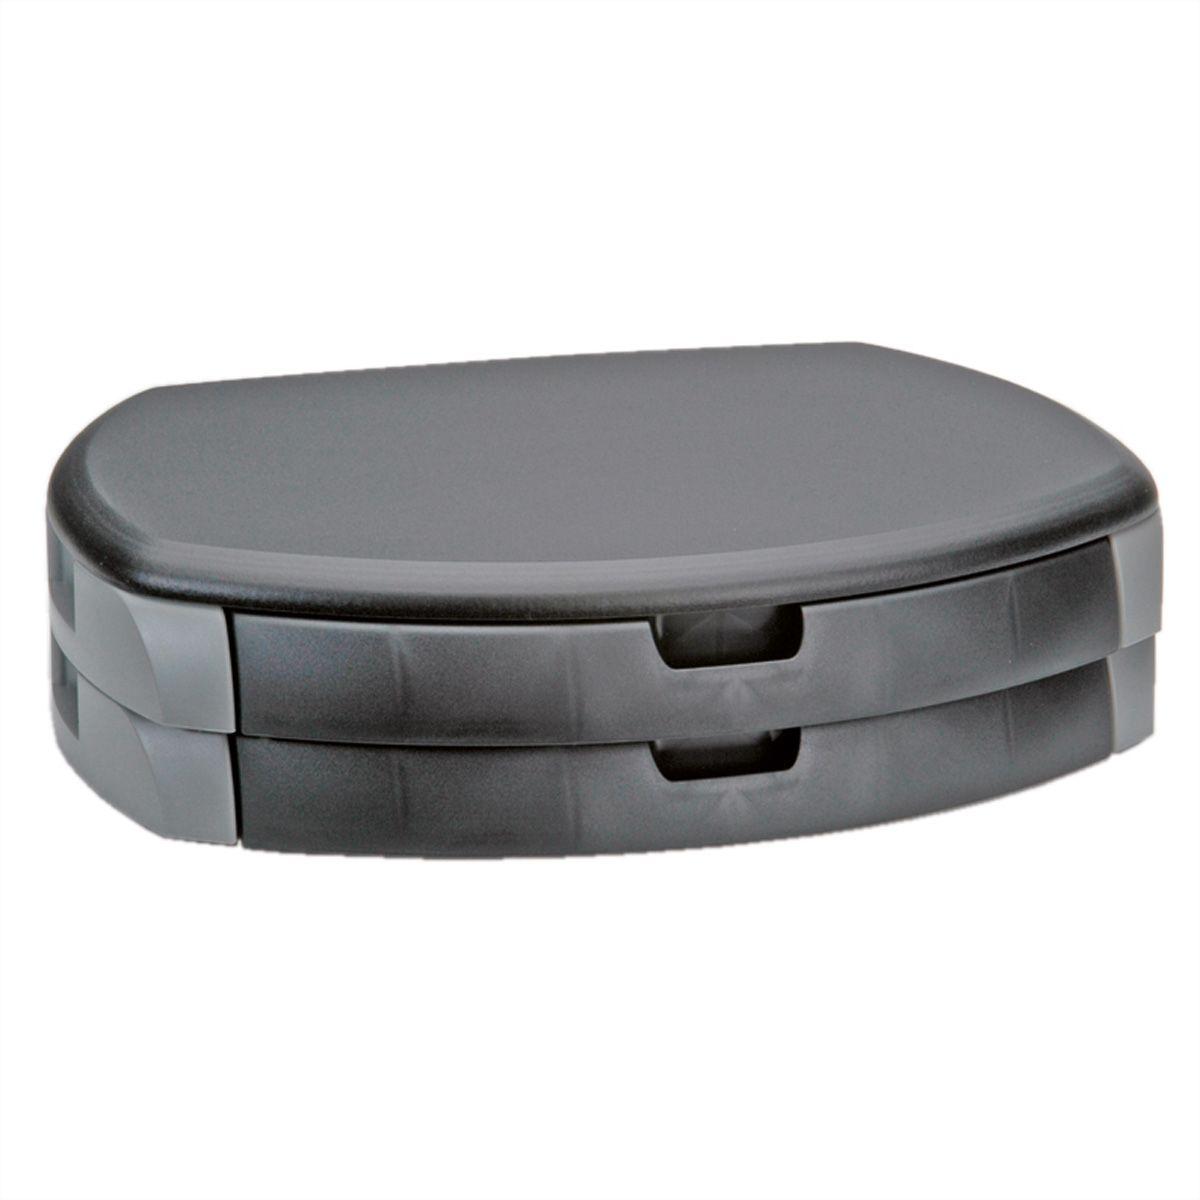 trend support pour cran ou imprimante secomp france. Black Bedroom Furniture Sets. Home Design Ideas